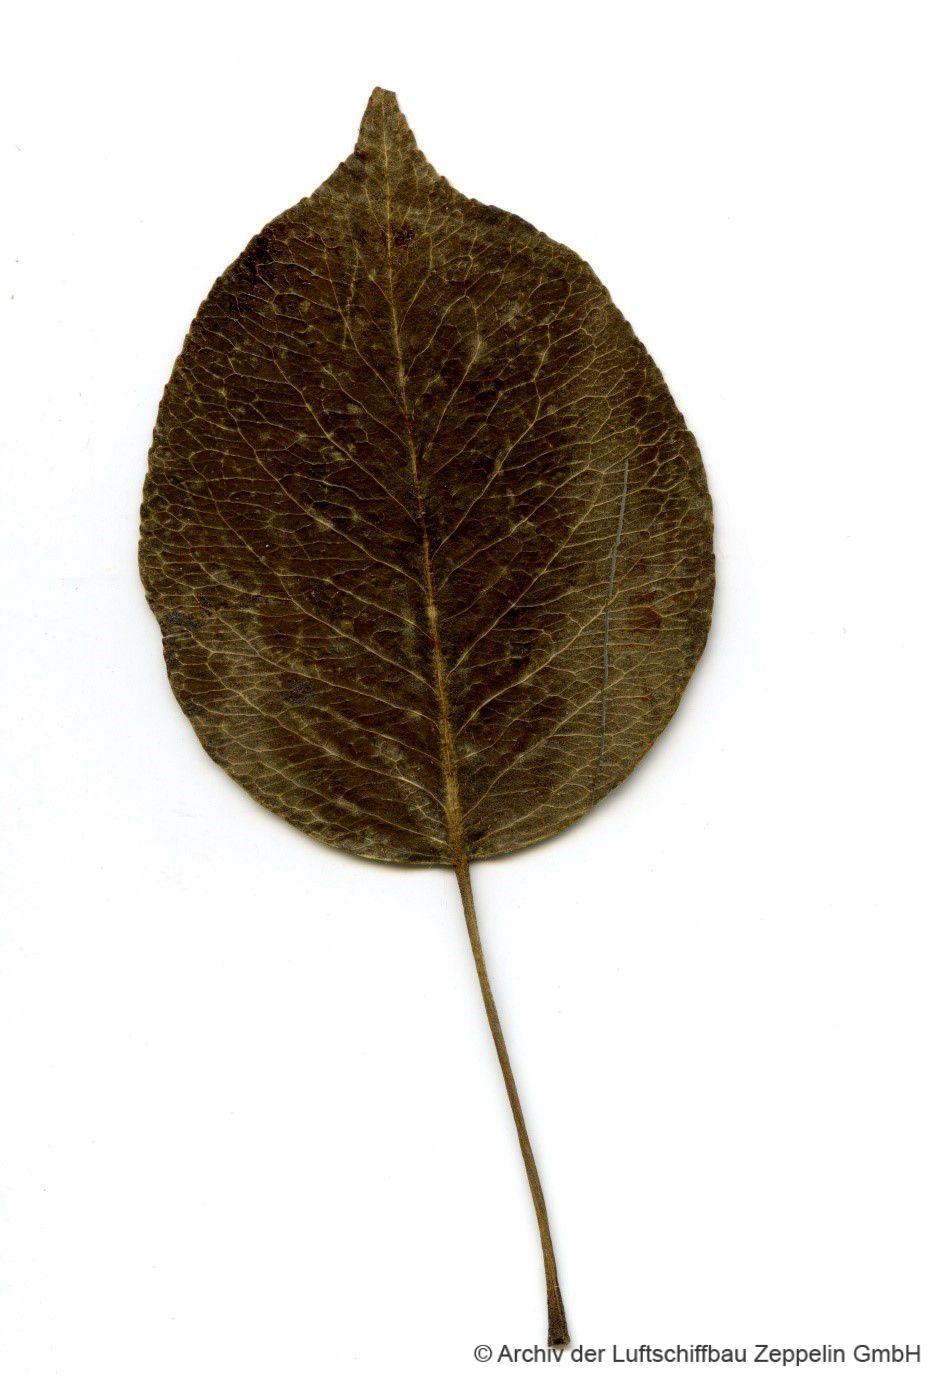 Blatt des Birnbaums